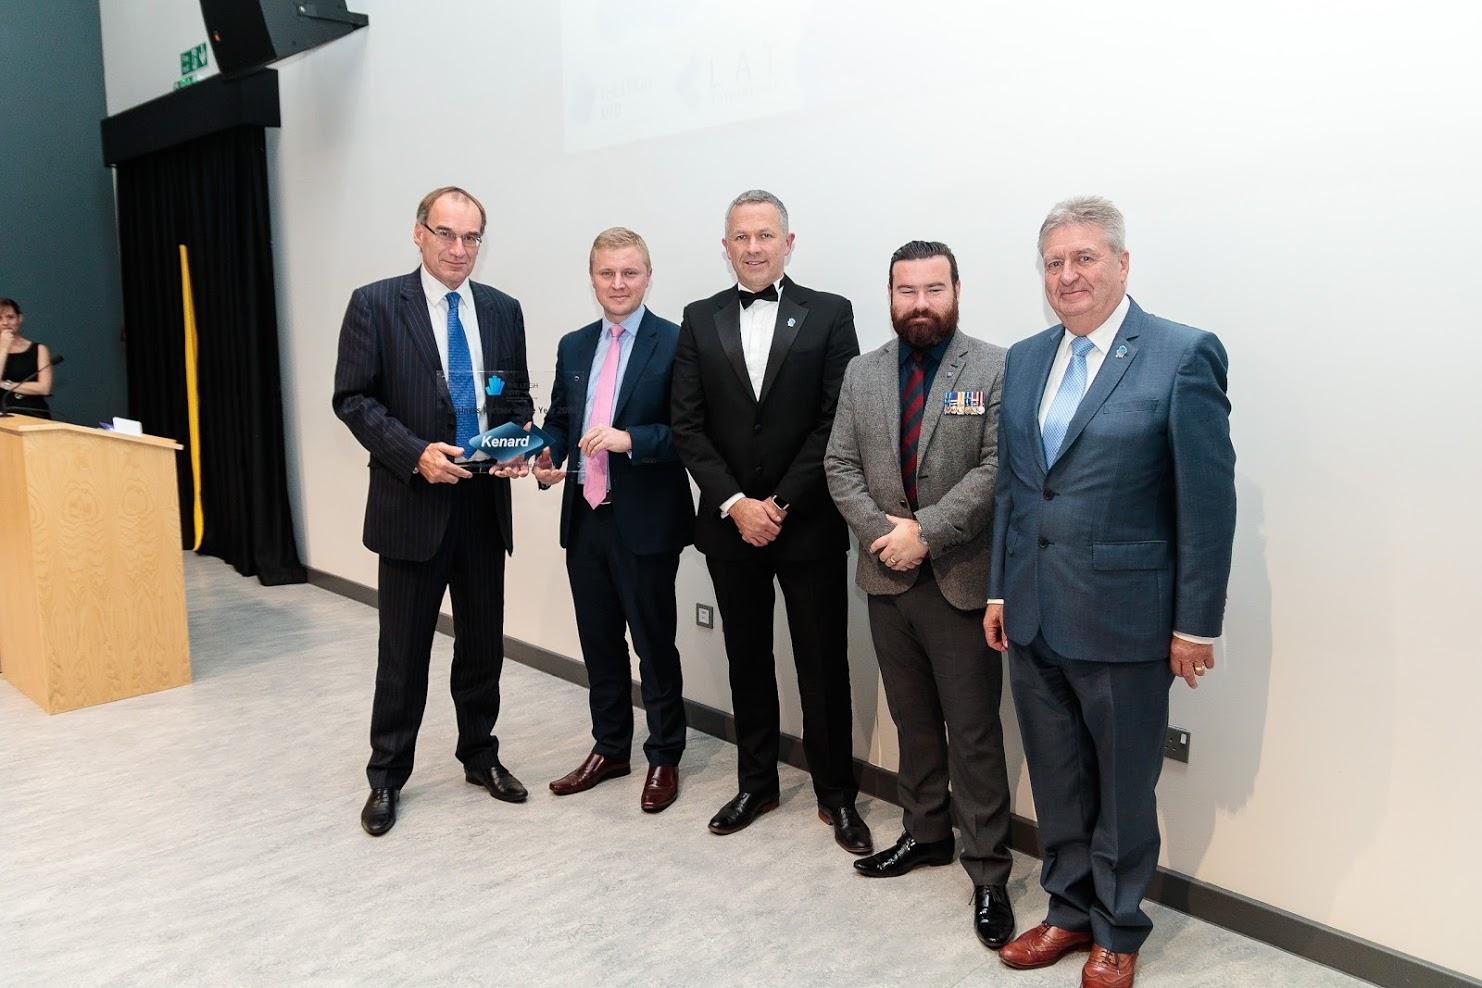 Kenard business partner of the year award